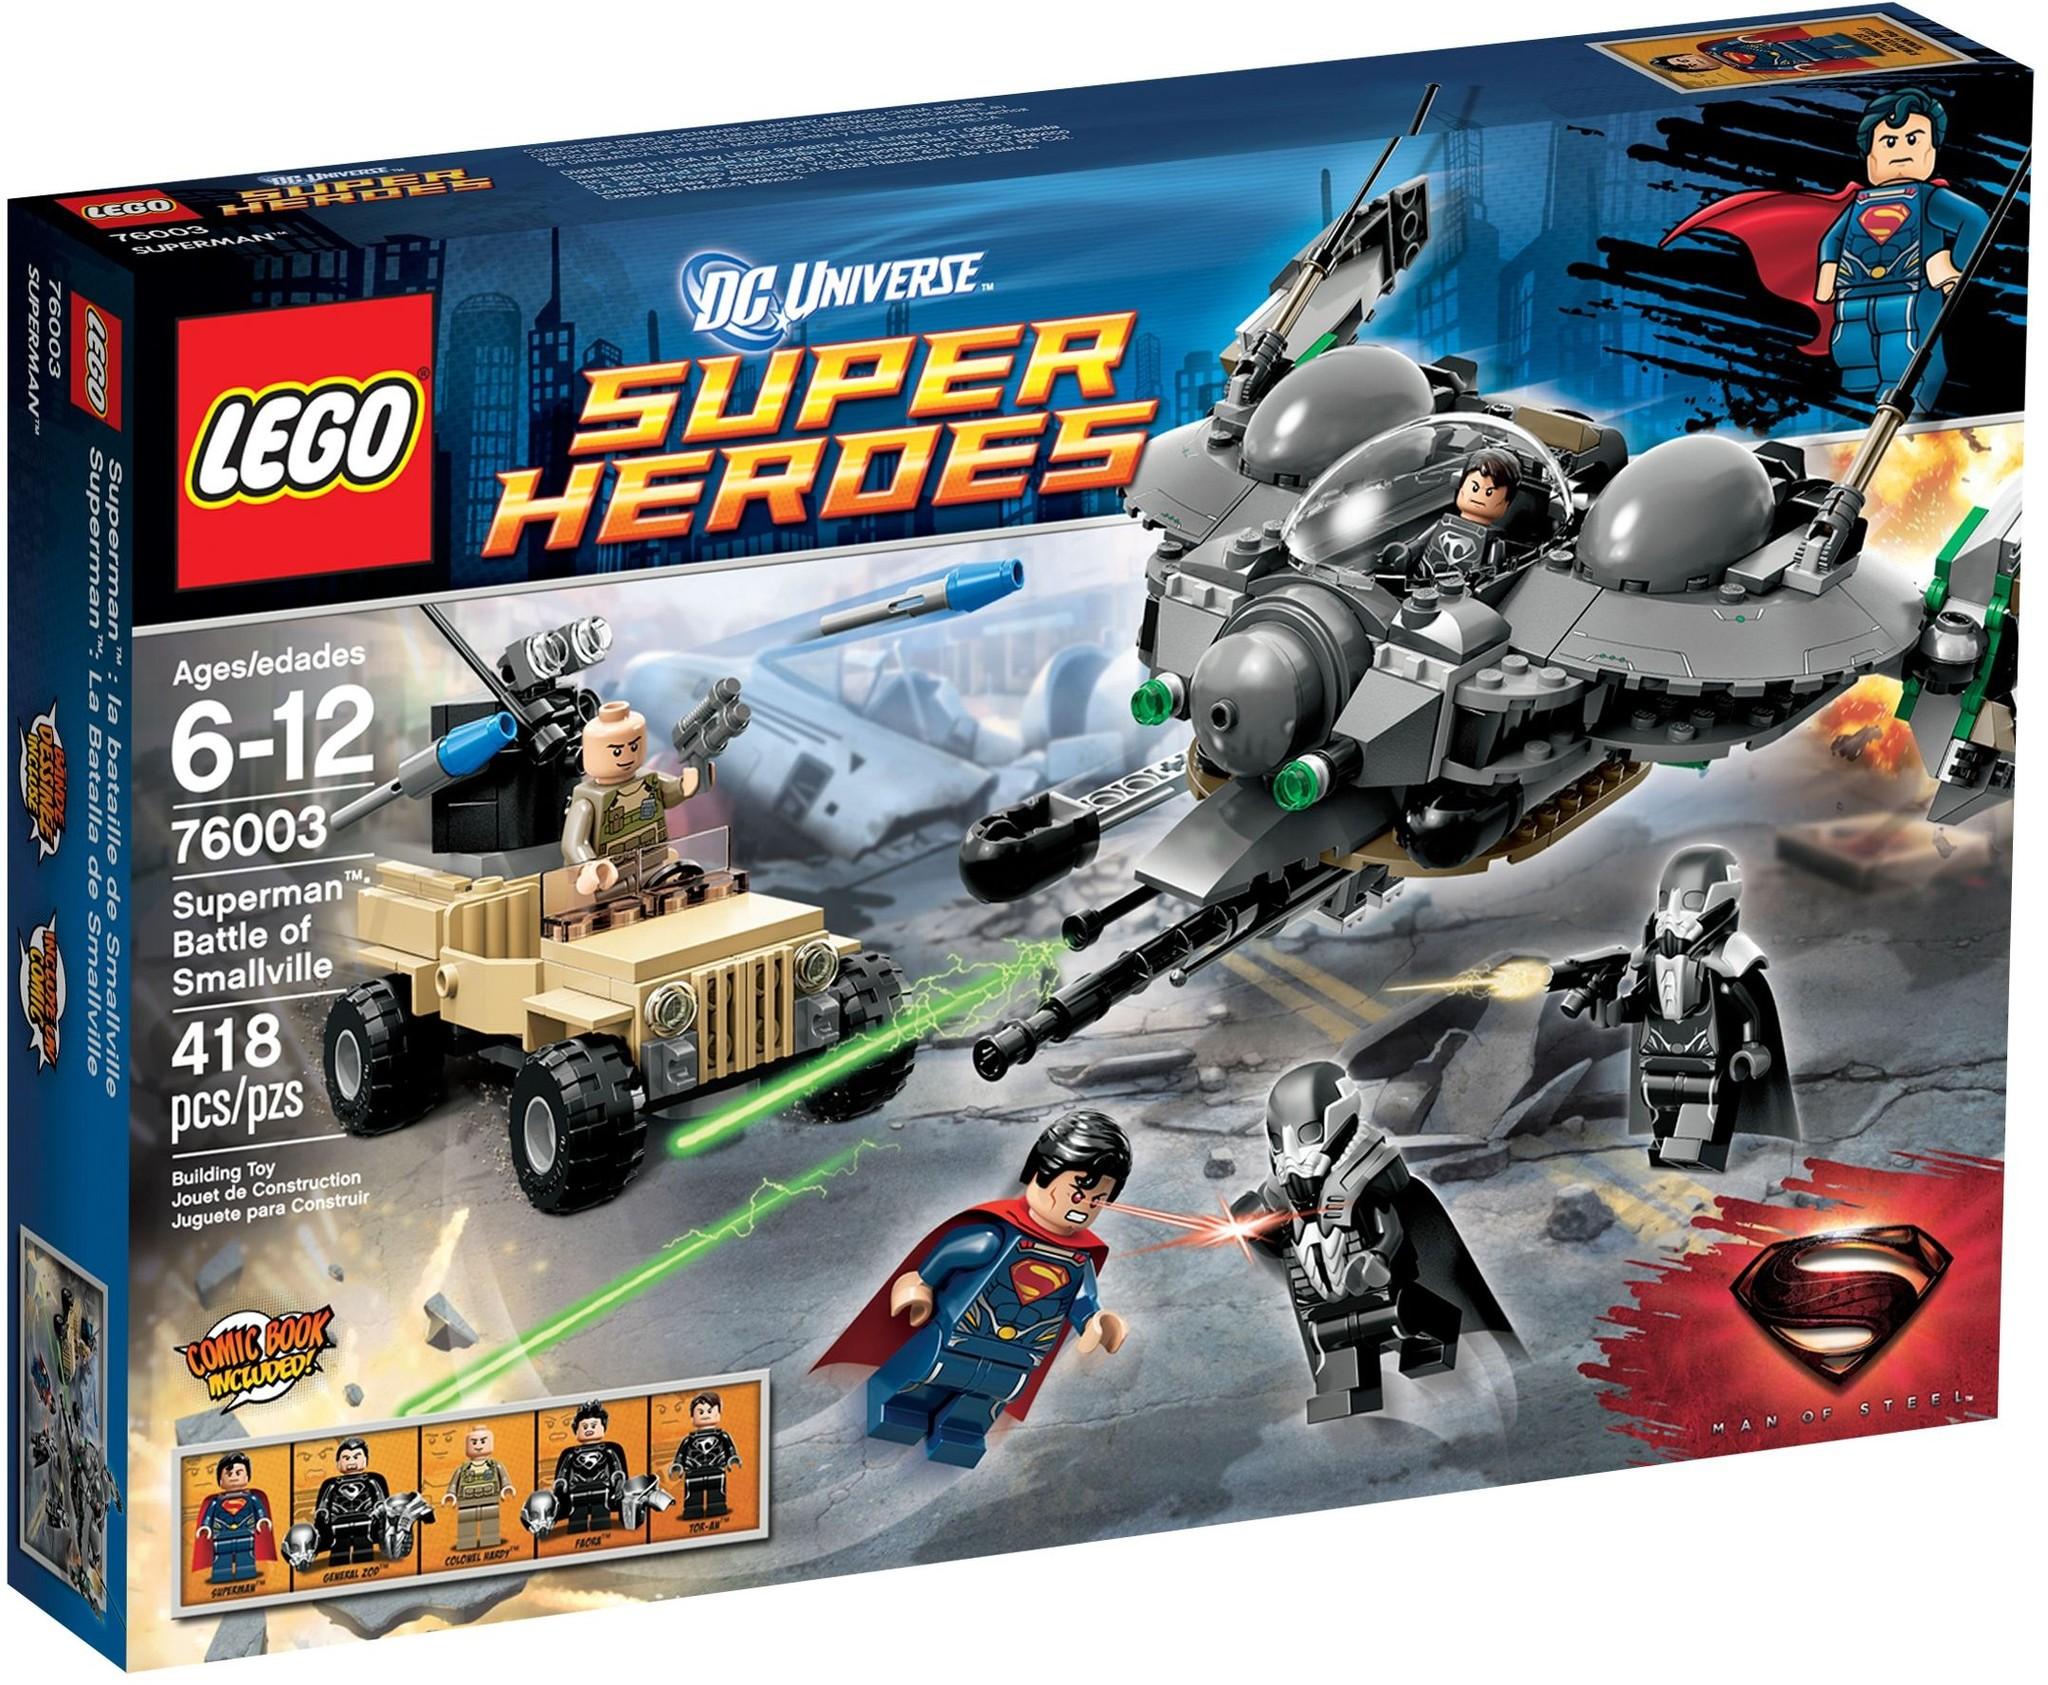 LEGO 76003 - Super Heroes - Superman: Battle of Smallville